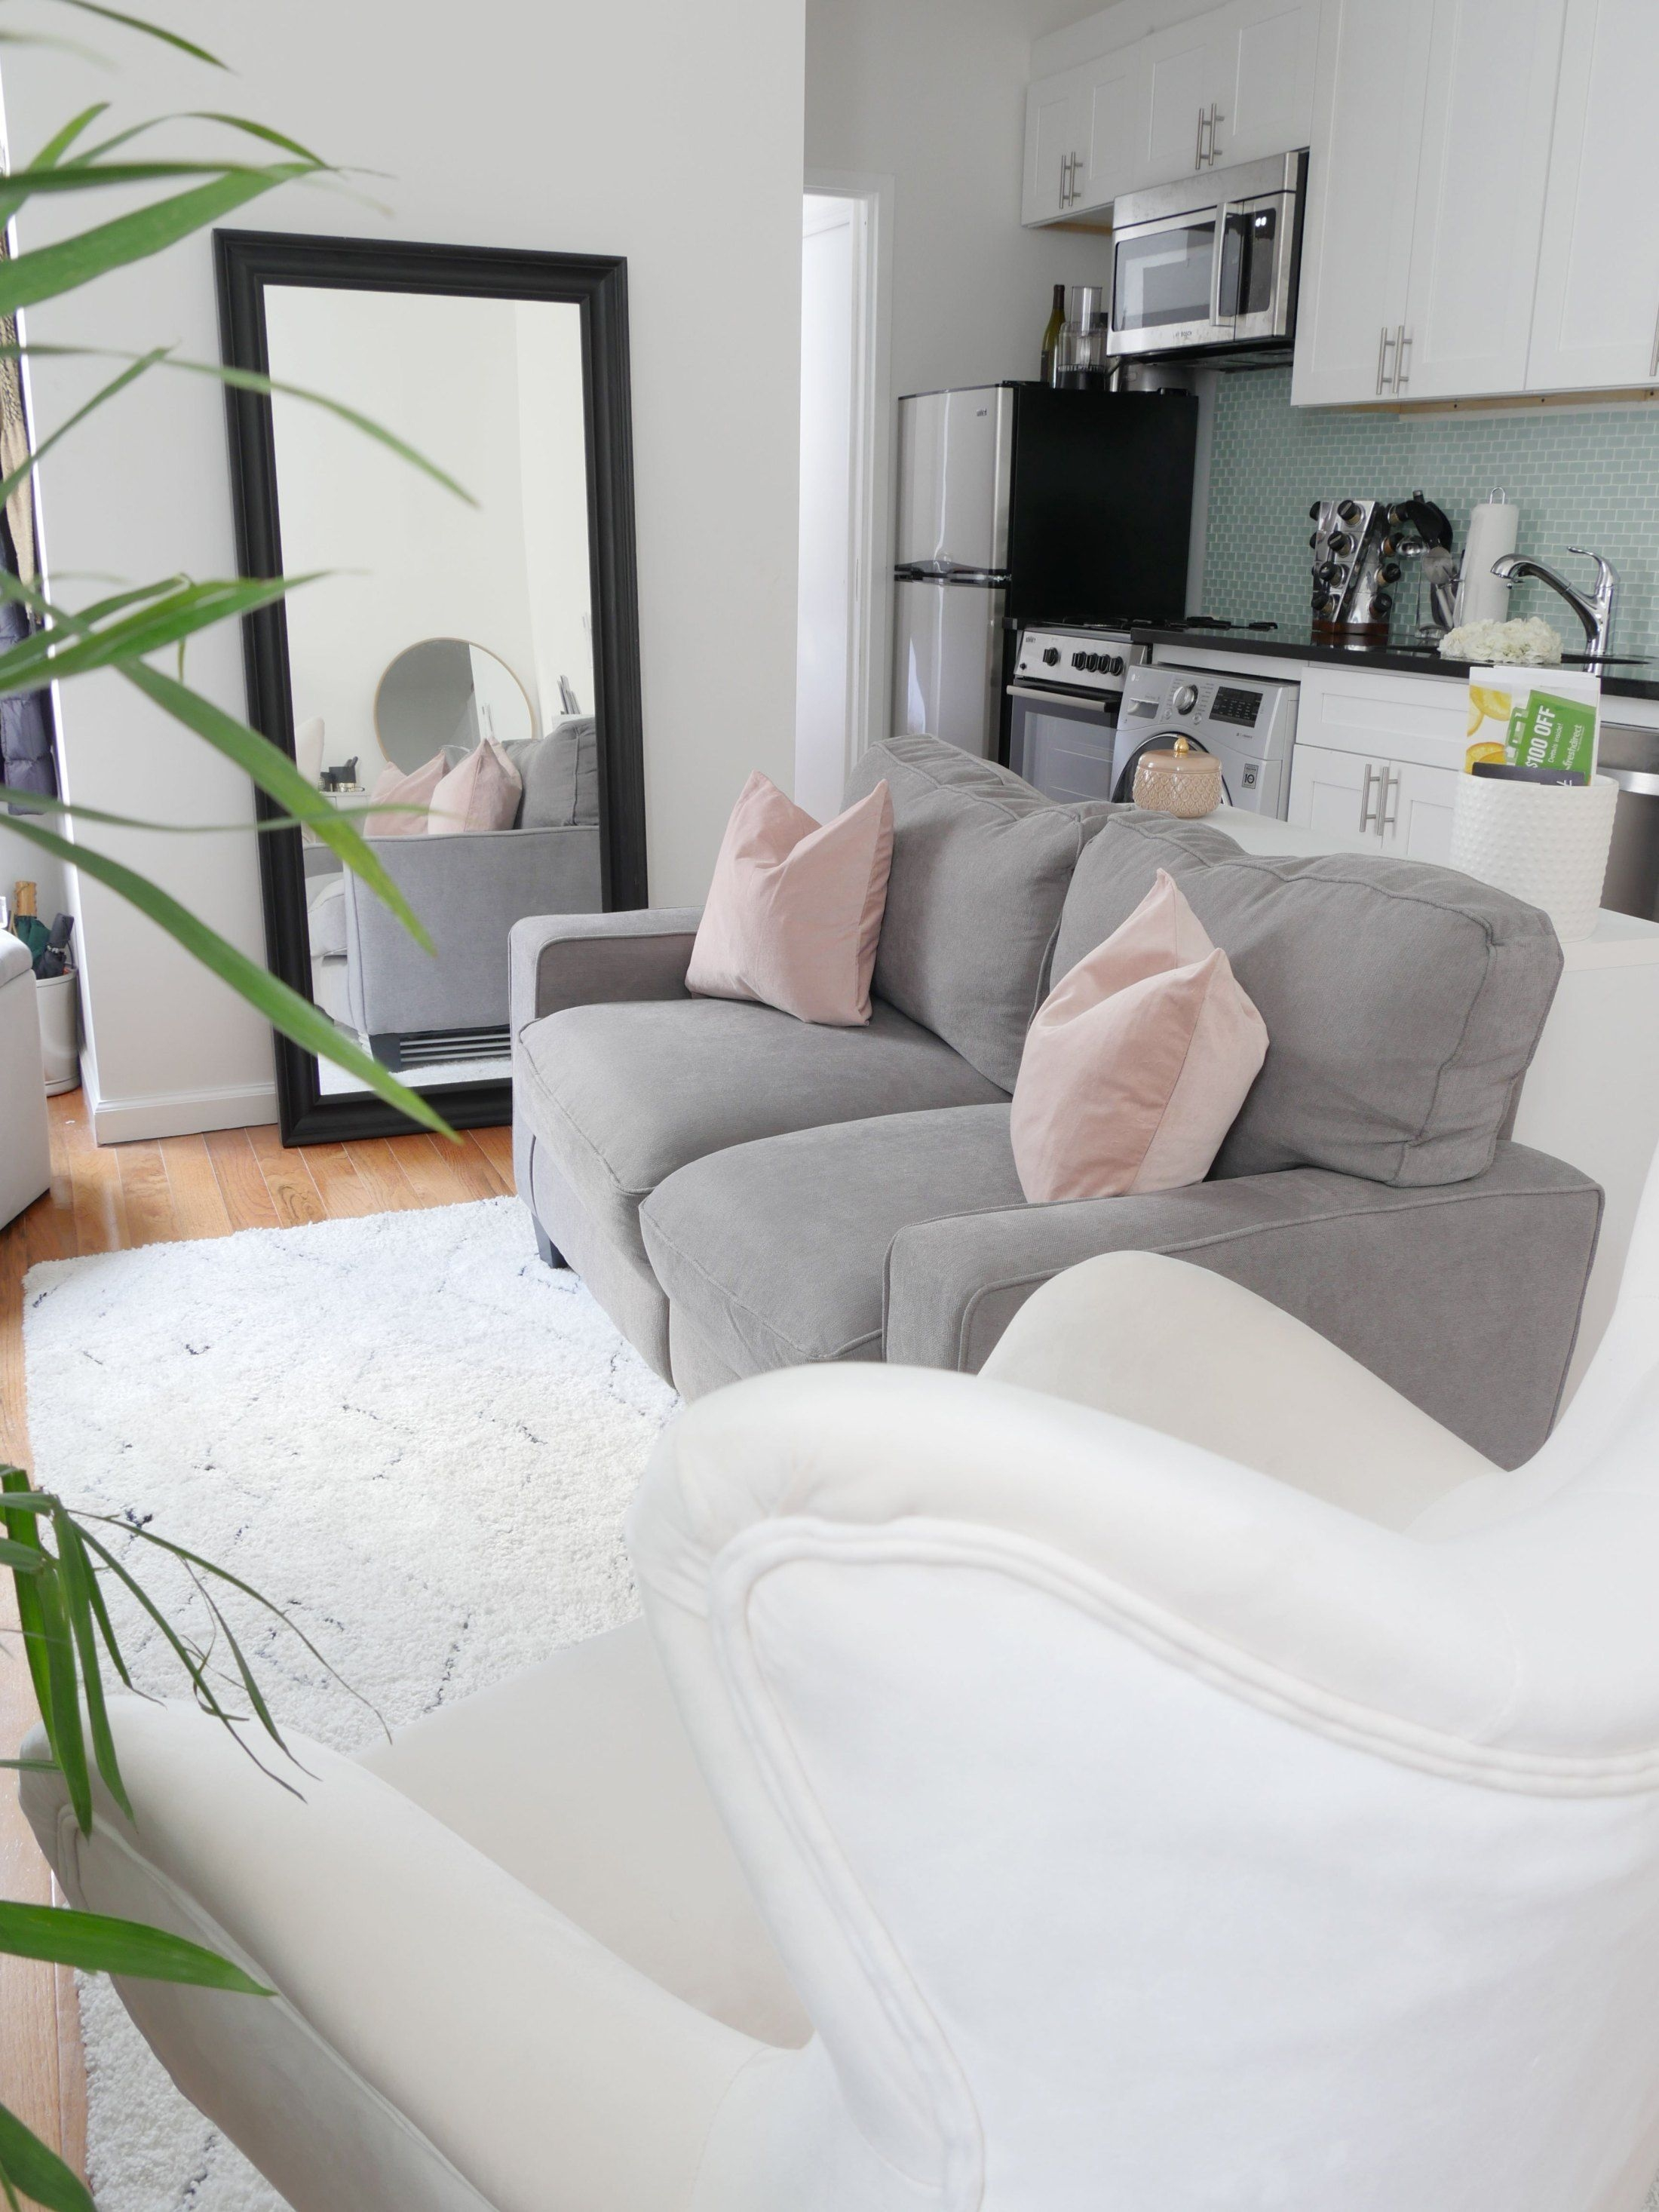 Astonishing Rental Apartment Decorating Ideas 23